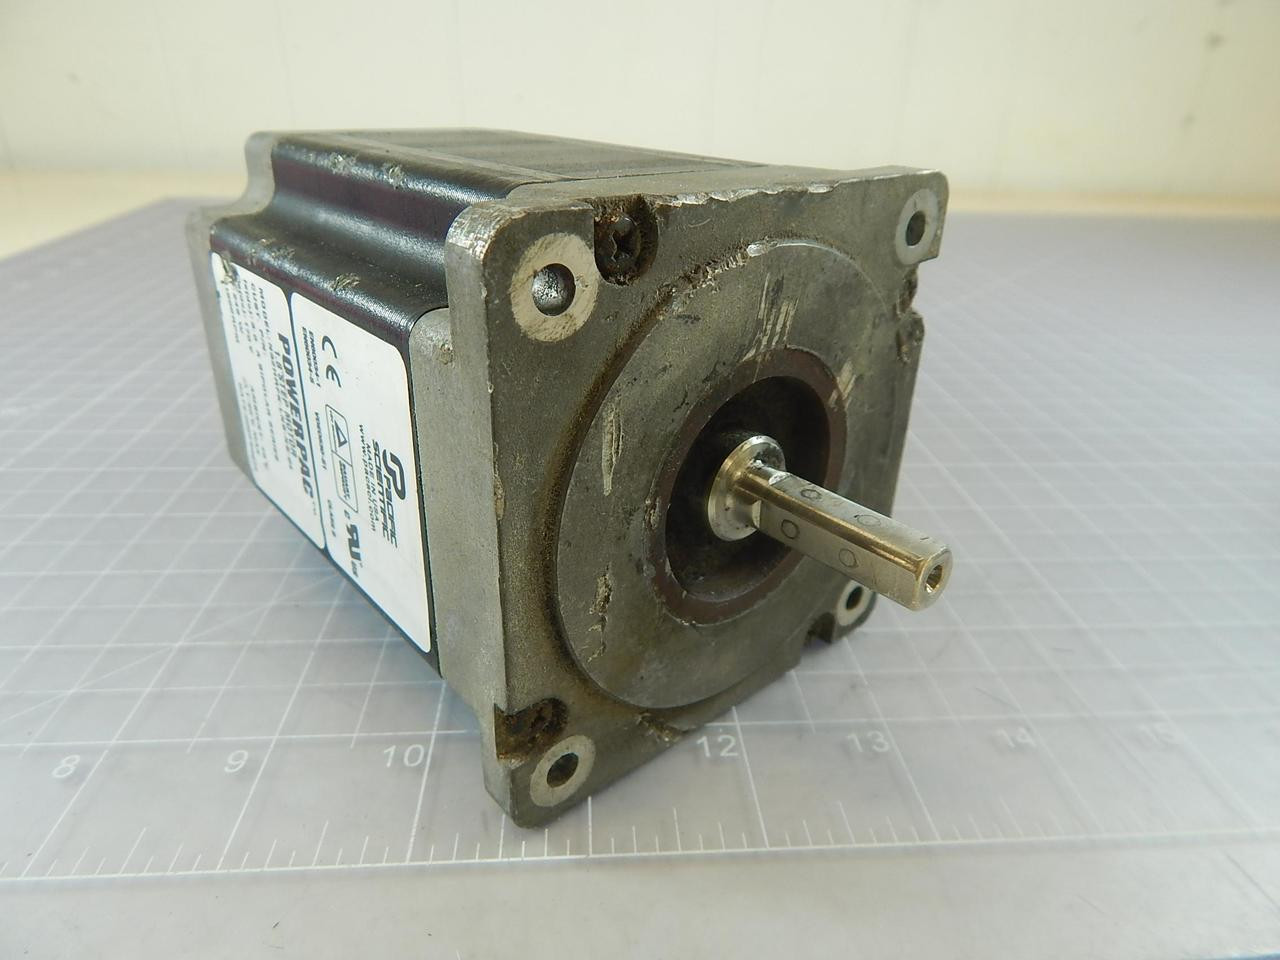 Pacific Scientific N32hrfk Lns Ns 04 Powerpac 1 8 Step Motor 246 W 170 V 1500 Rpm 3 0 A T96559